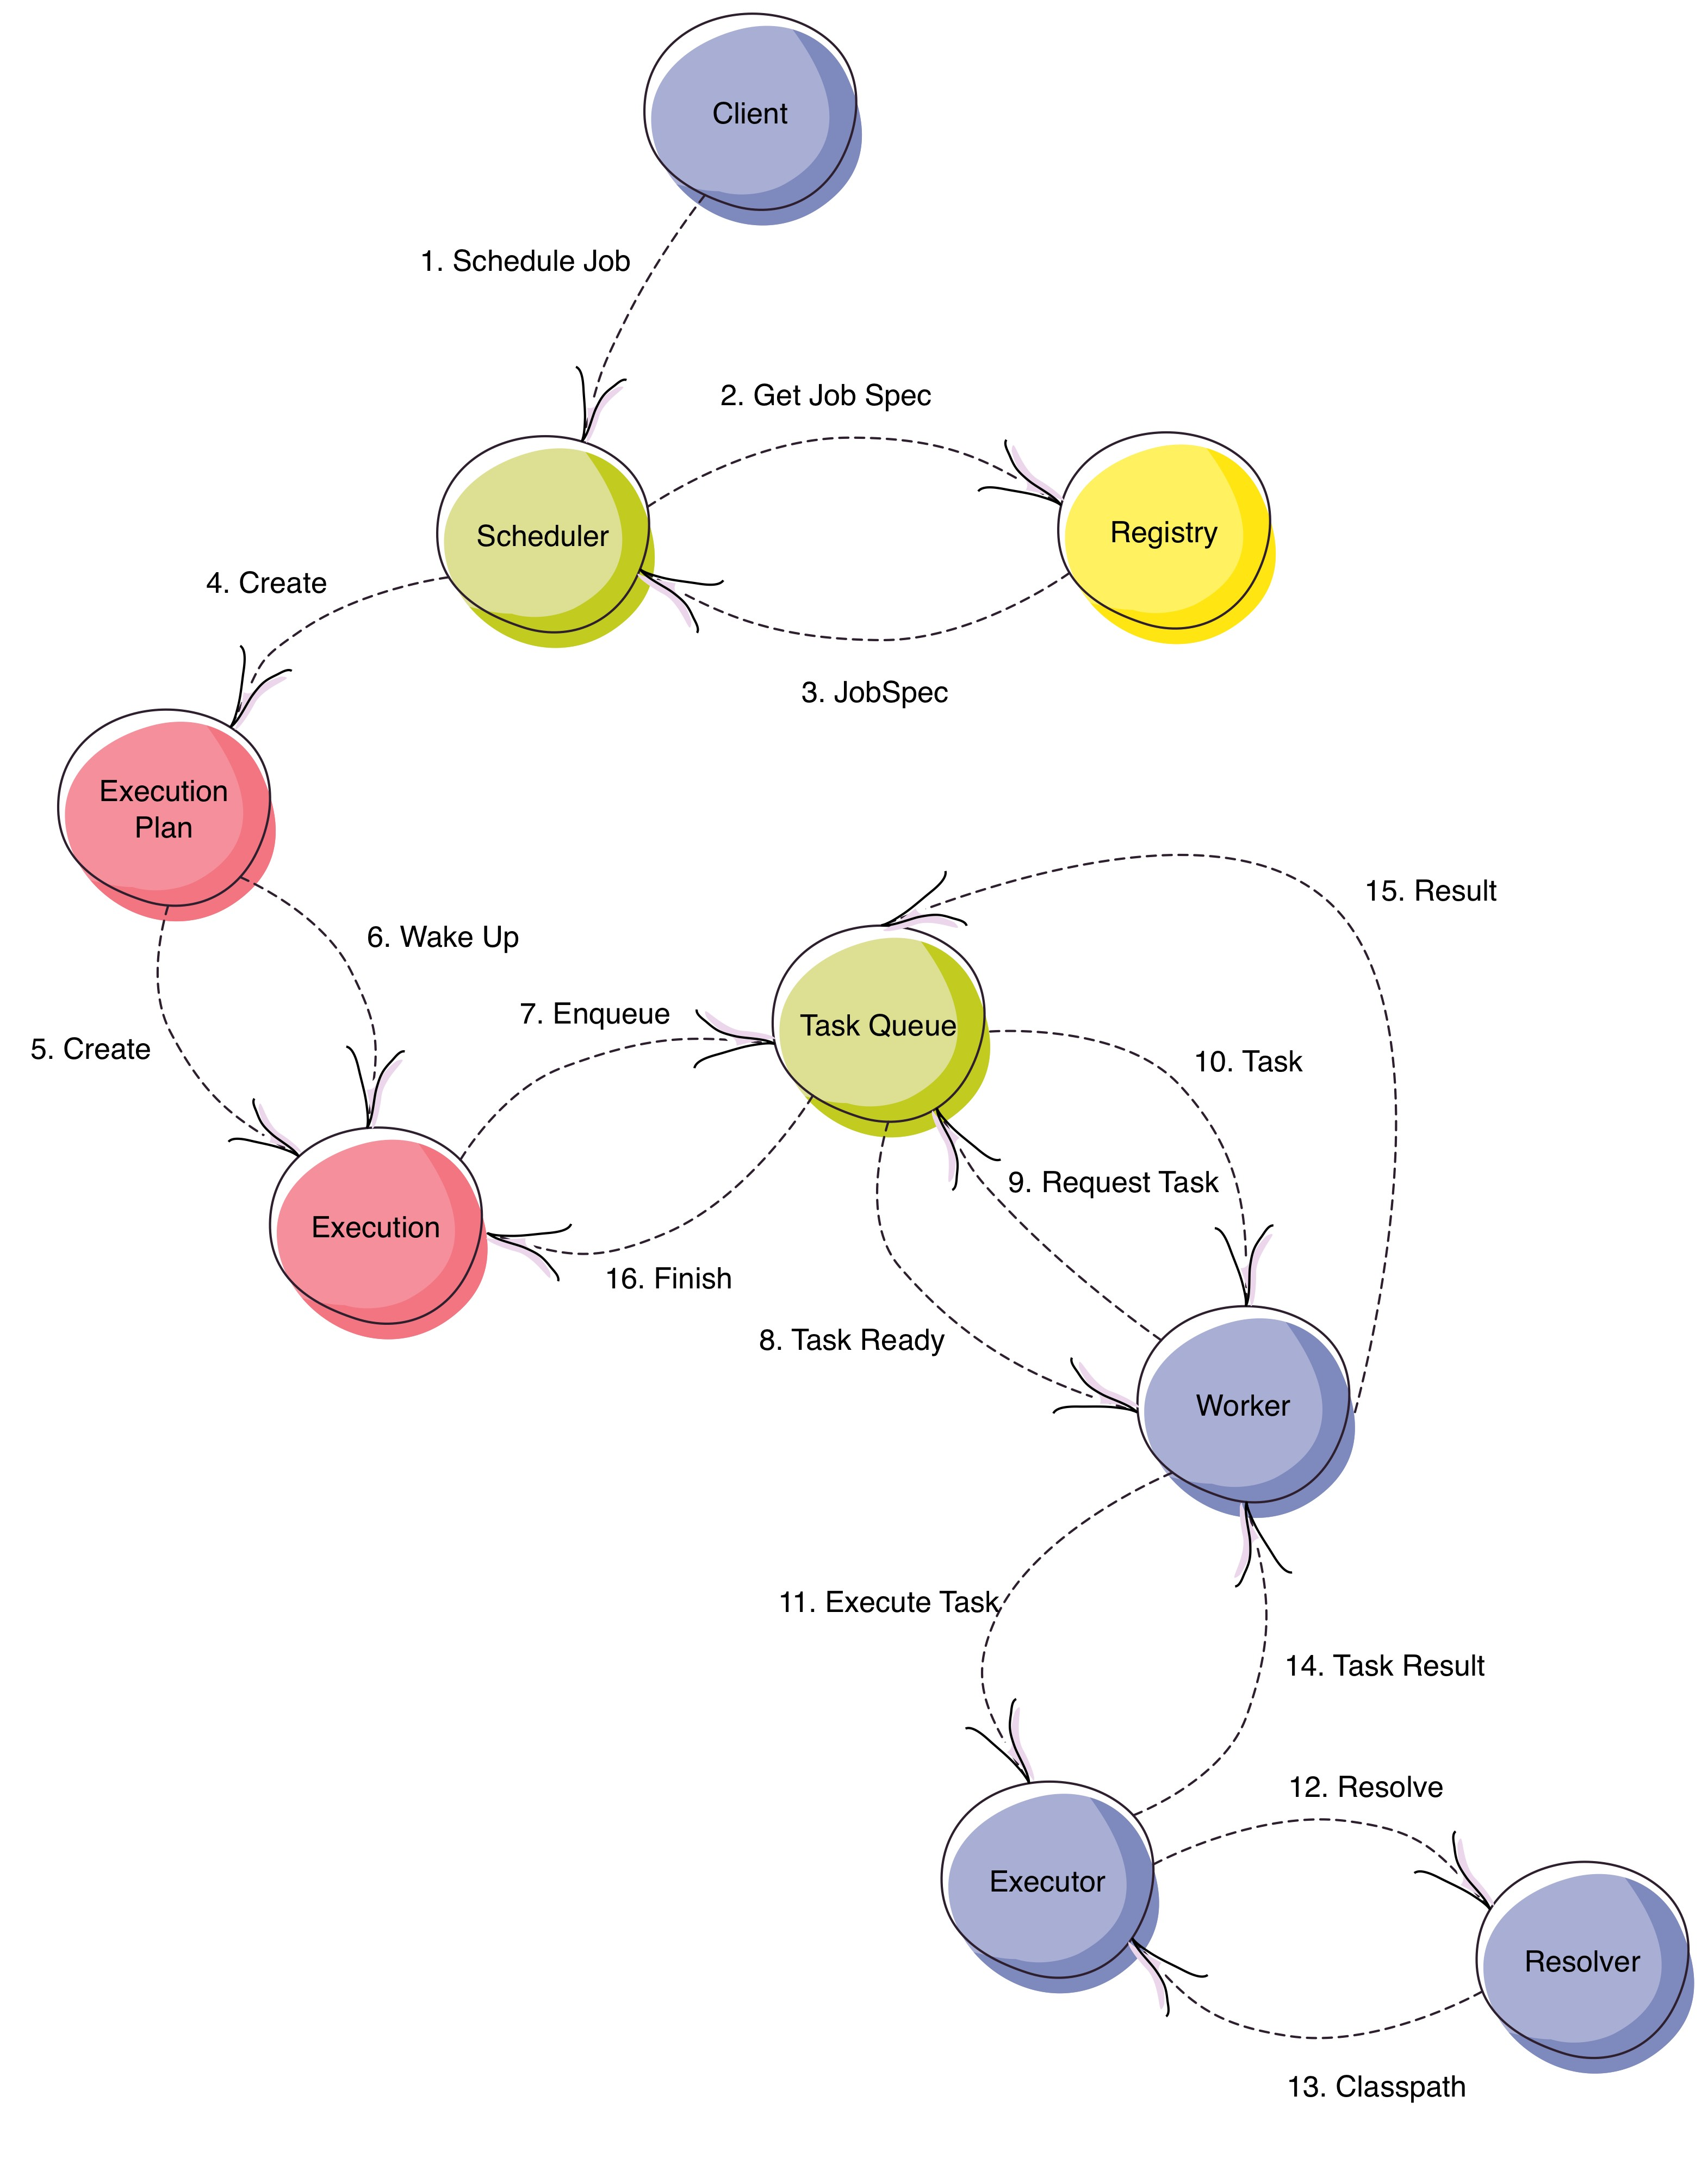 Schedule Job Workflow